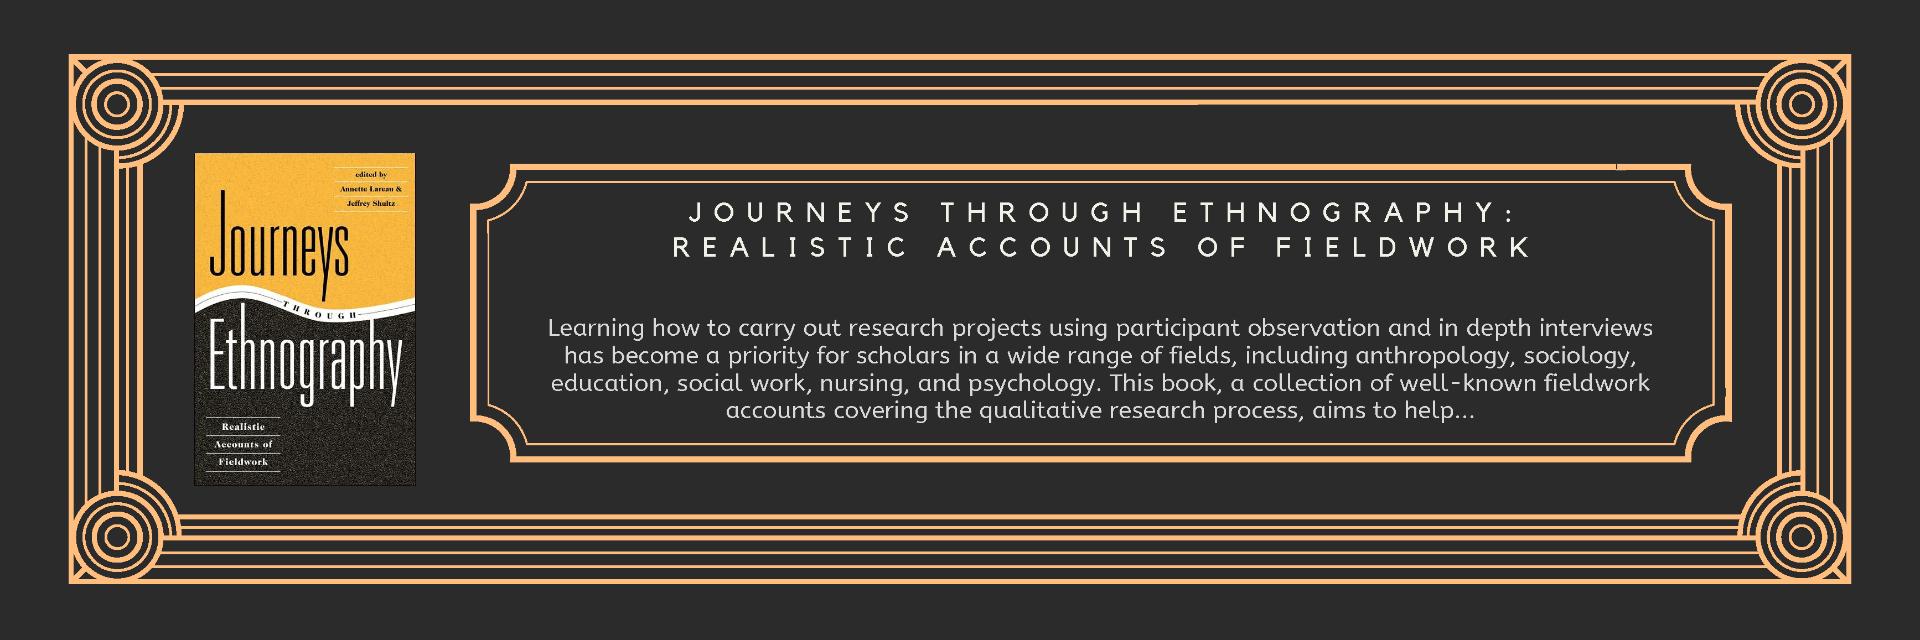 Book Journeys Through Ethnography